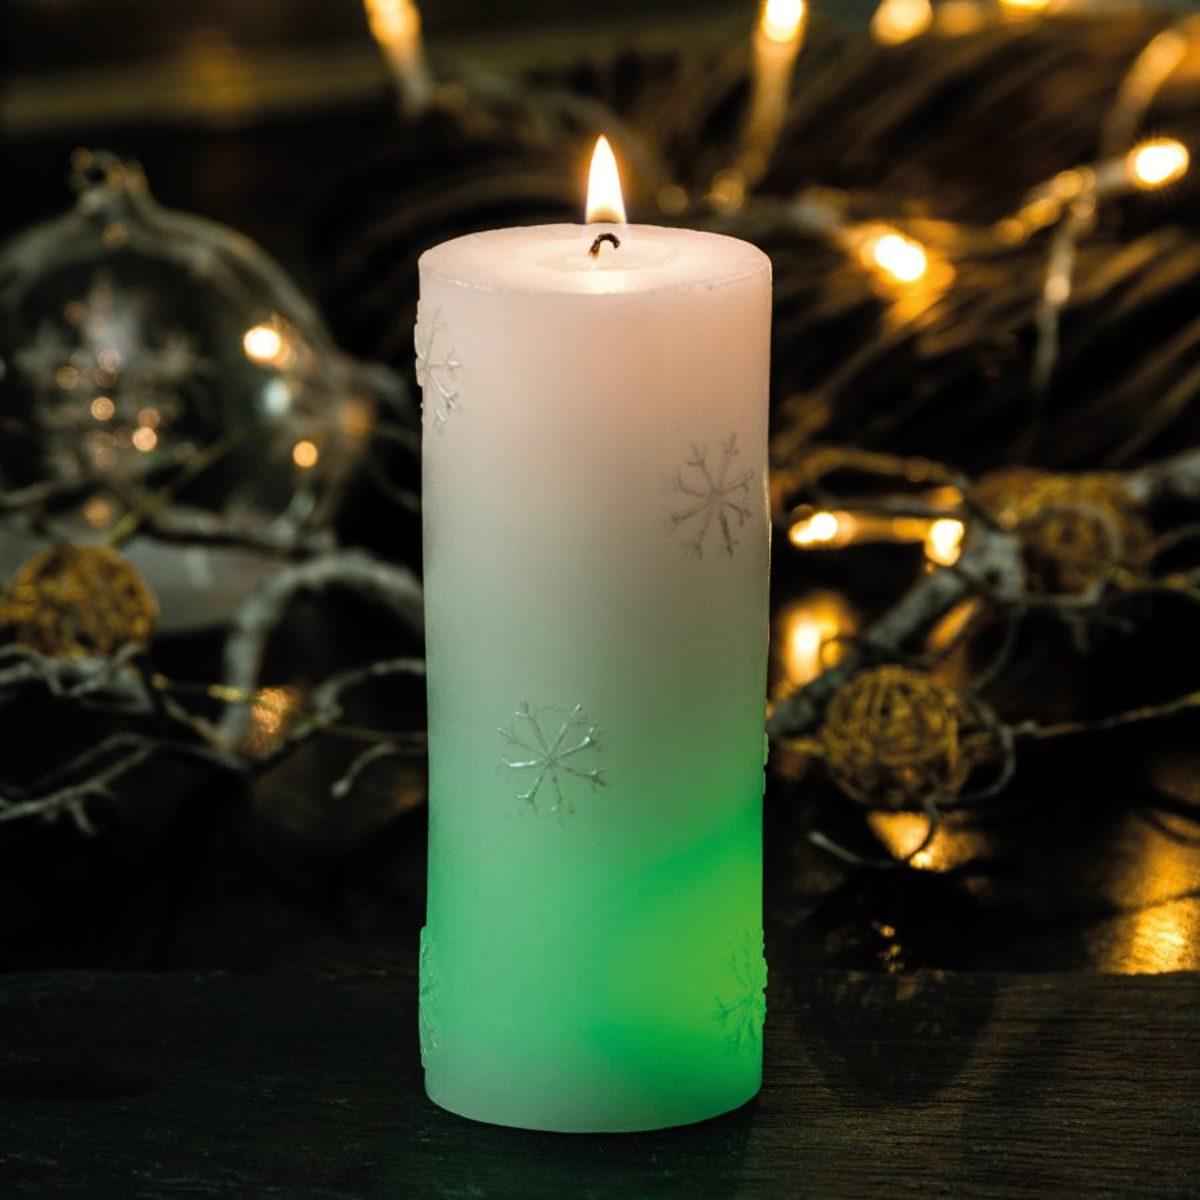 Bild 3 von LIVING ART     LED Farbwechsel Kerze